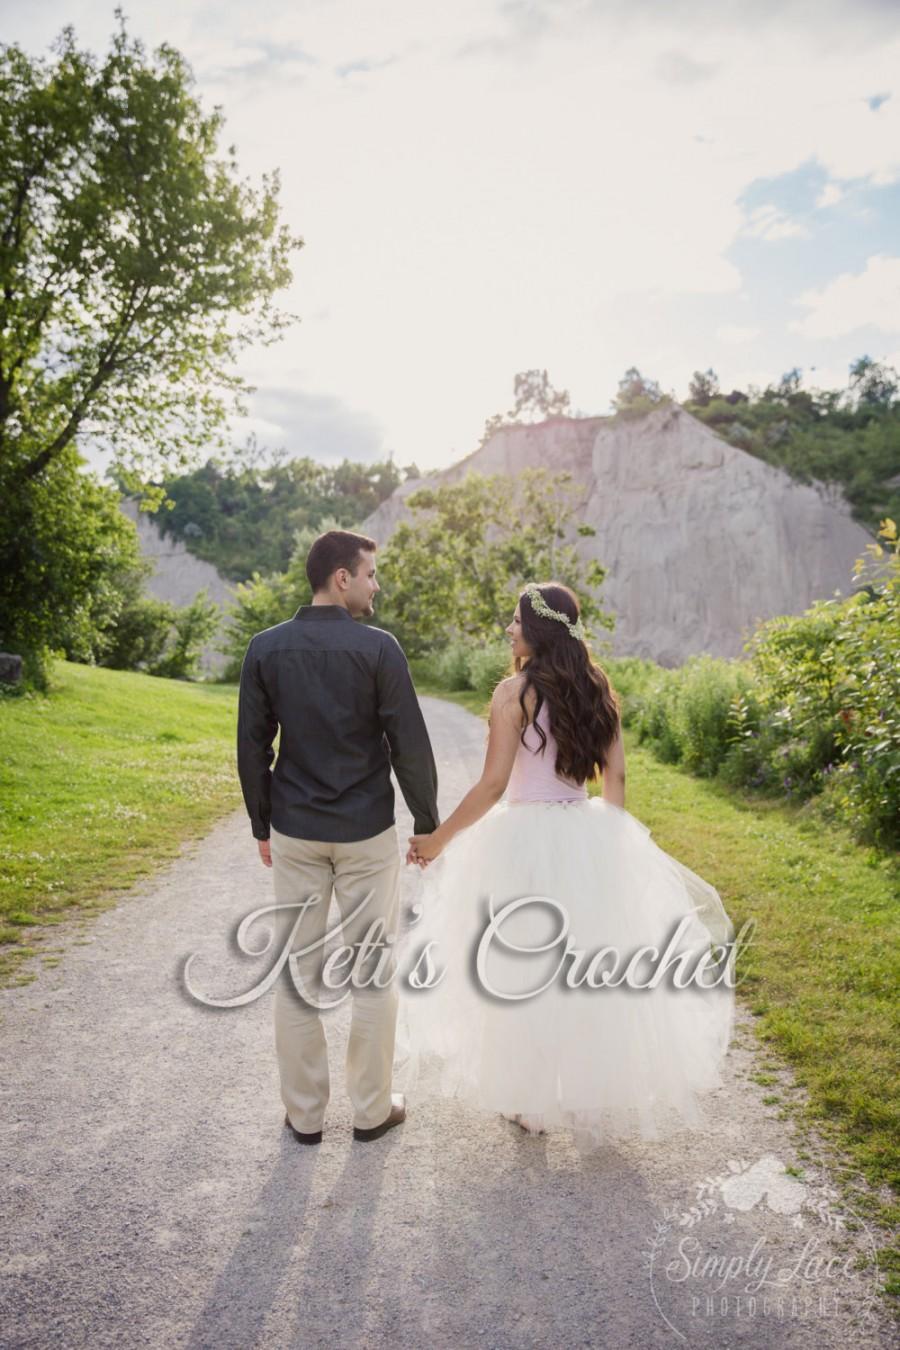 Mariage - Bridal Tutu Skirt,Wedding Bridal Tutu,Adult Tutu,Bridesmaid, Prom Skirt,Adult tutu dress,Long tutu skirt,Ivory adult tutu skirt